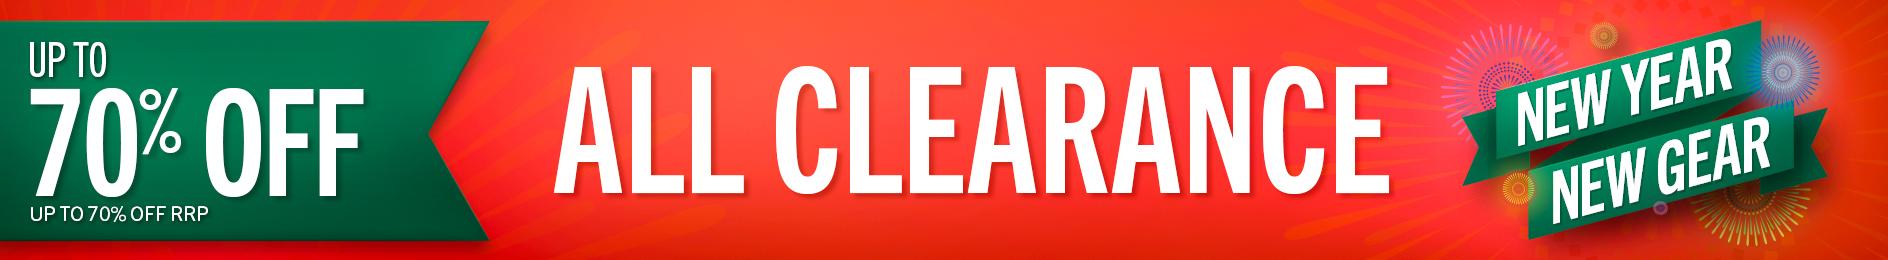 nyng-banner-clearance.jpg